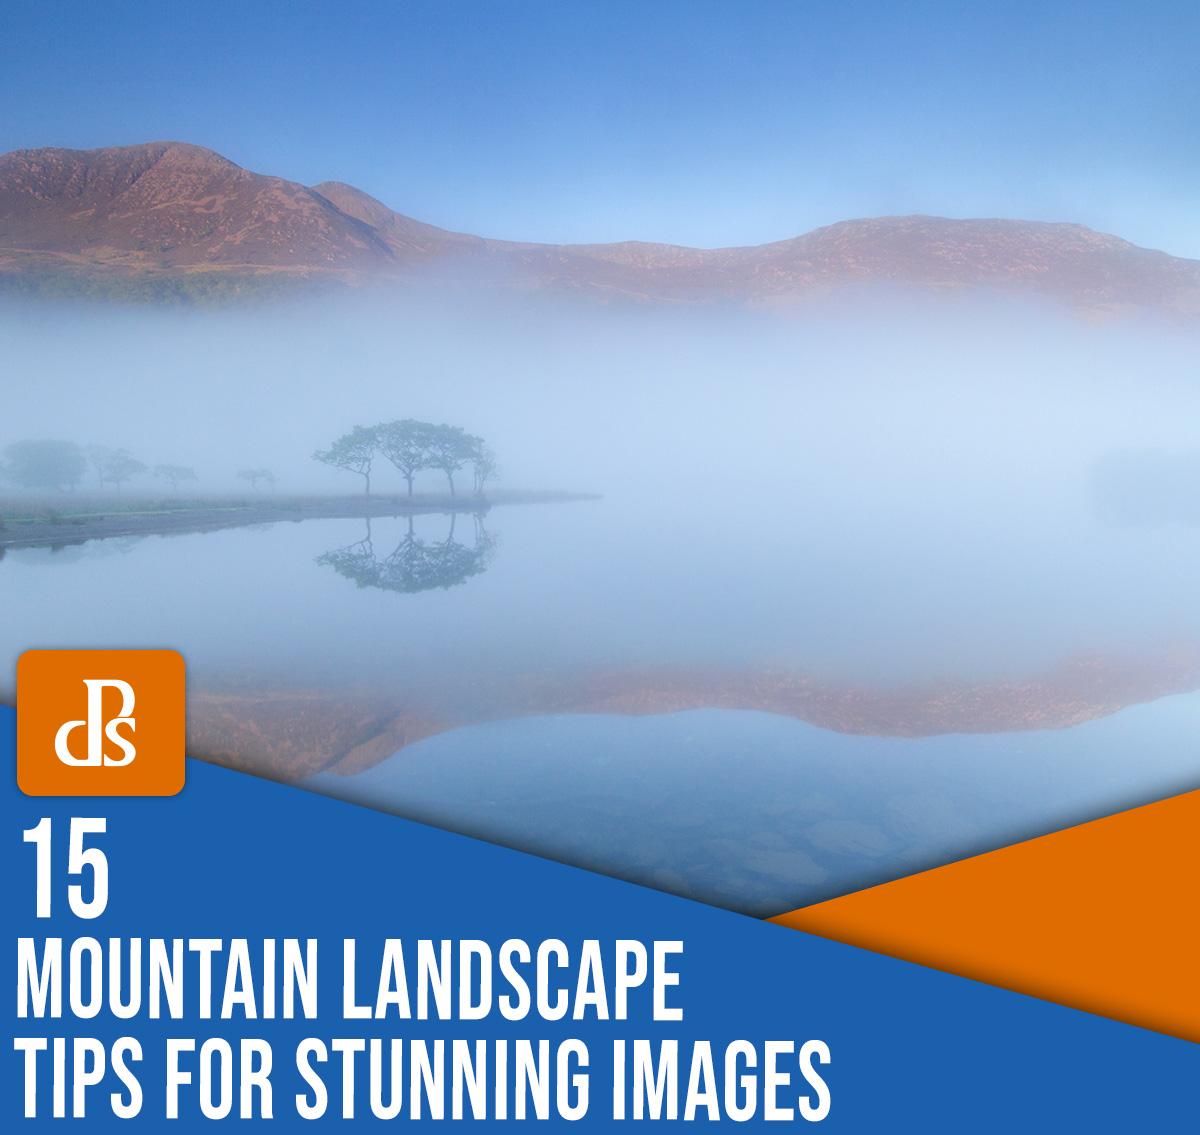 https://i2.wp.com/digital-photography-school.com/wp-content/uploads/2021/04/mountain-landscape-photography-1001.jpg?resize=1200%2C1135&ssl=1